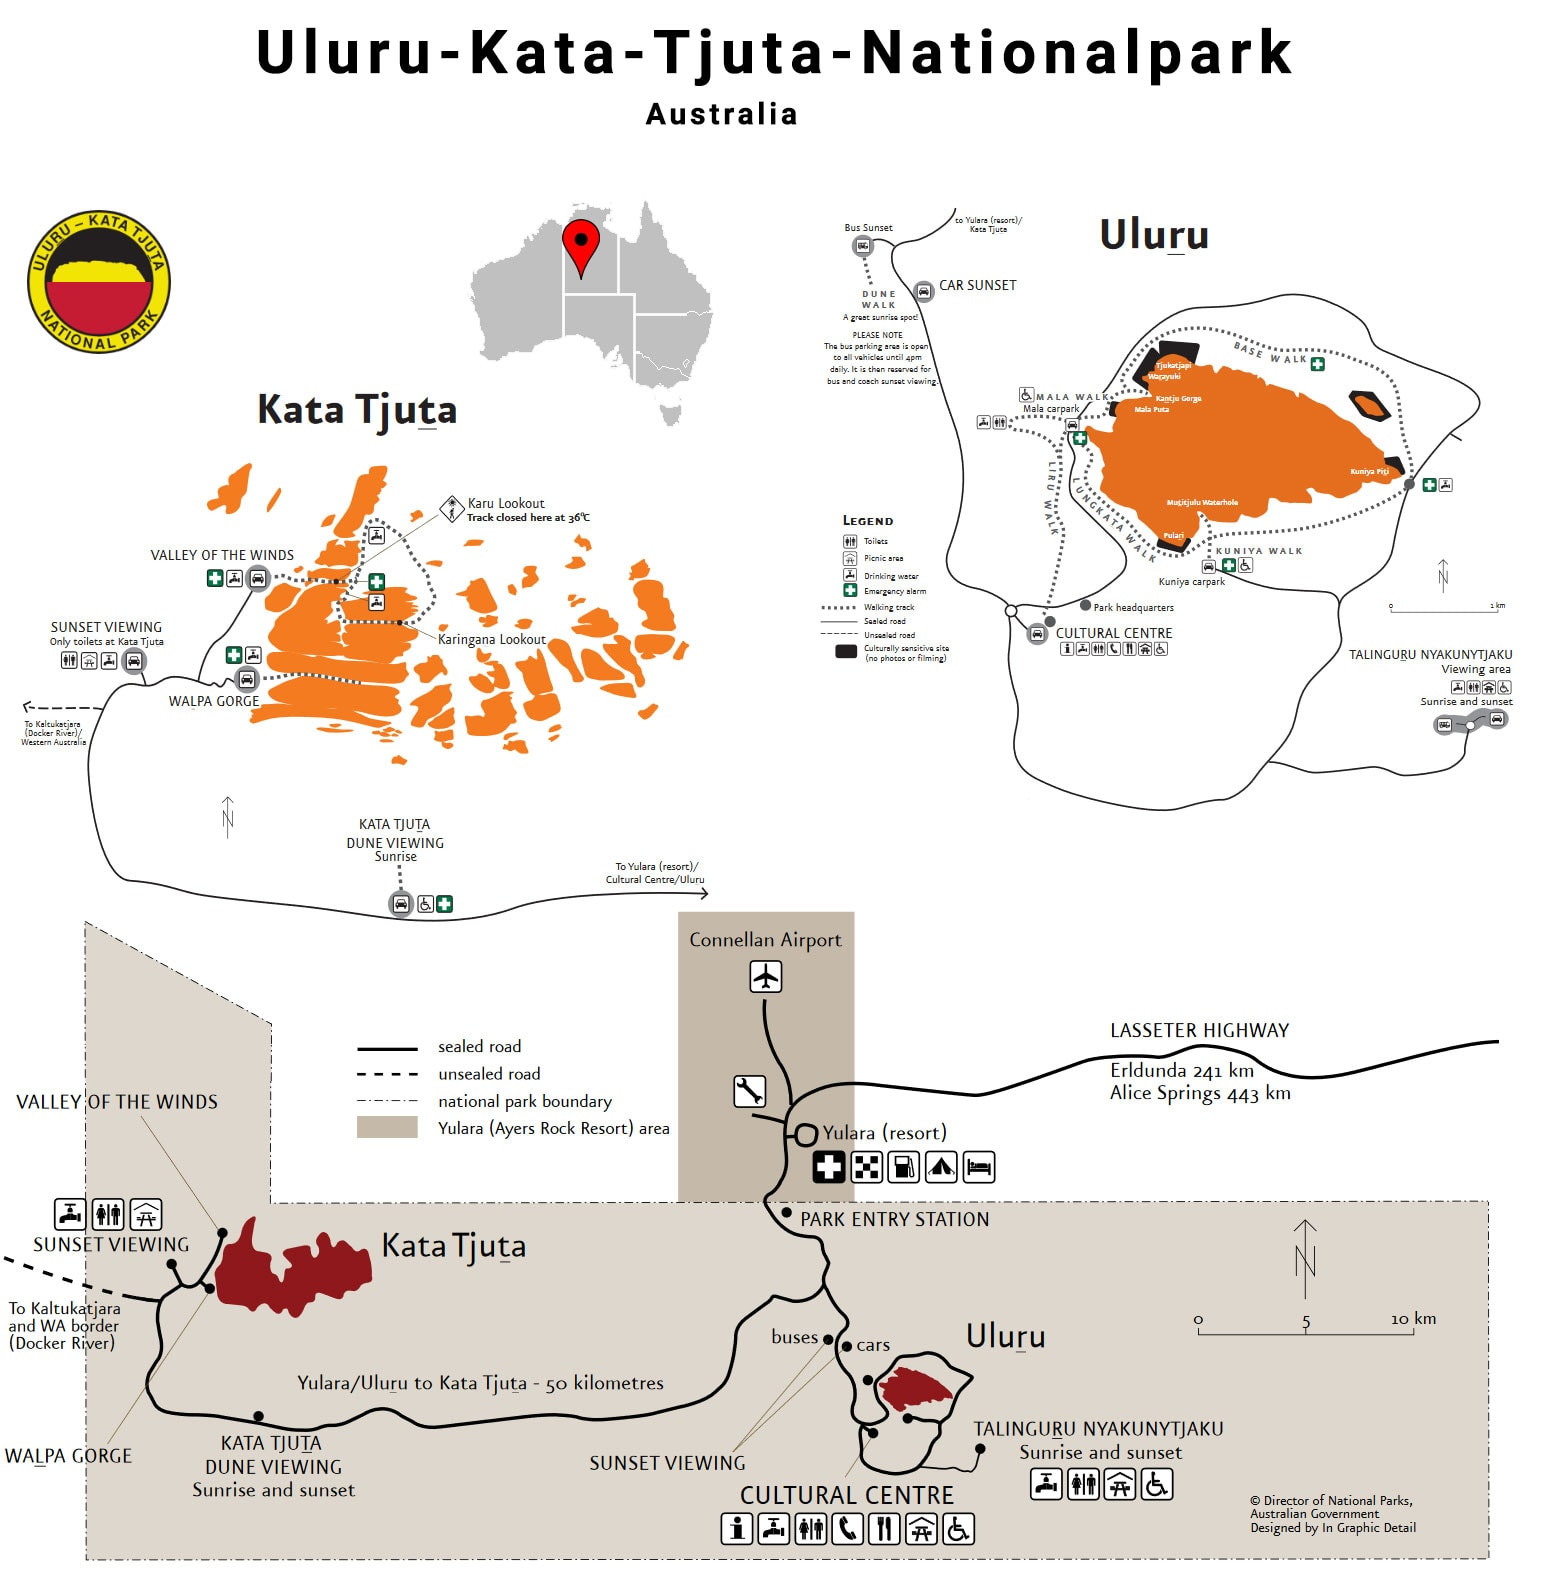 Map, Uluru-Kata-Tjuta National Park, Plan, Ayers Rock, Uluru, Australia, Travel Report